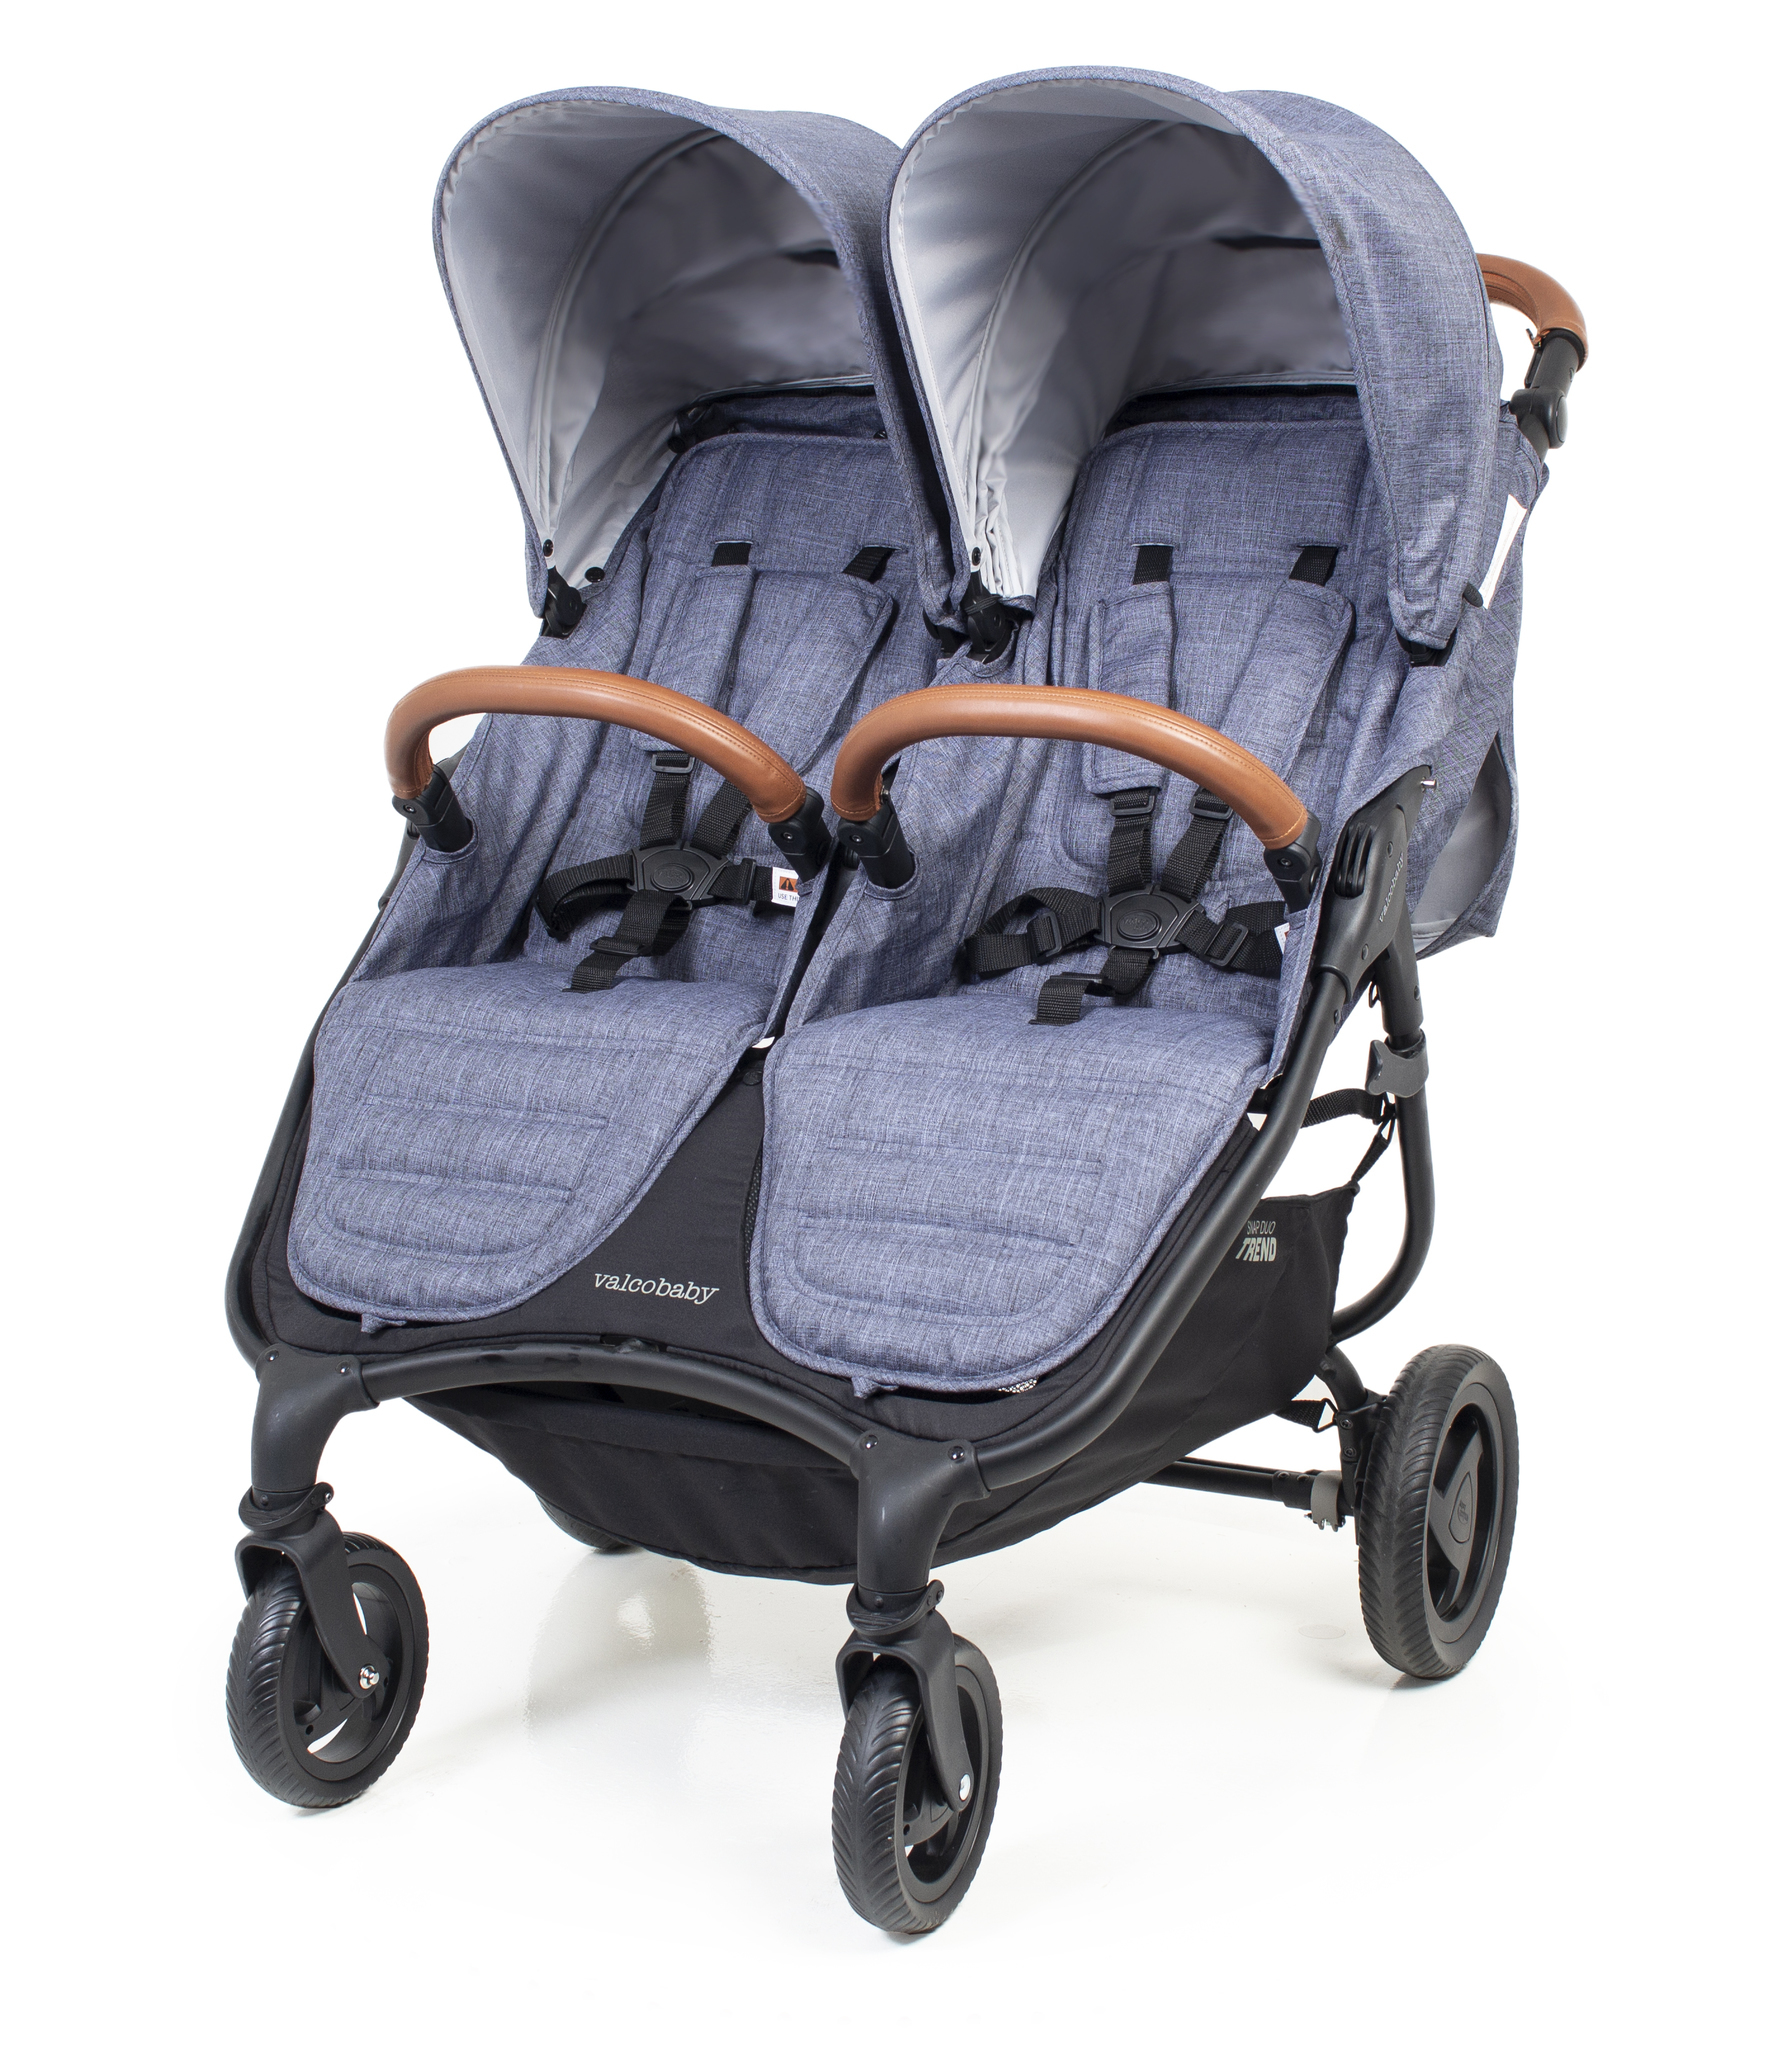 Коляска для двойни Valco baby Snap Duo Trend / Charcoal